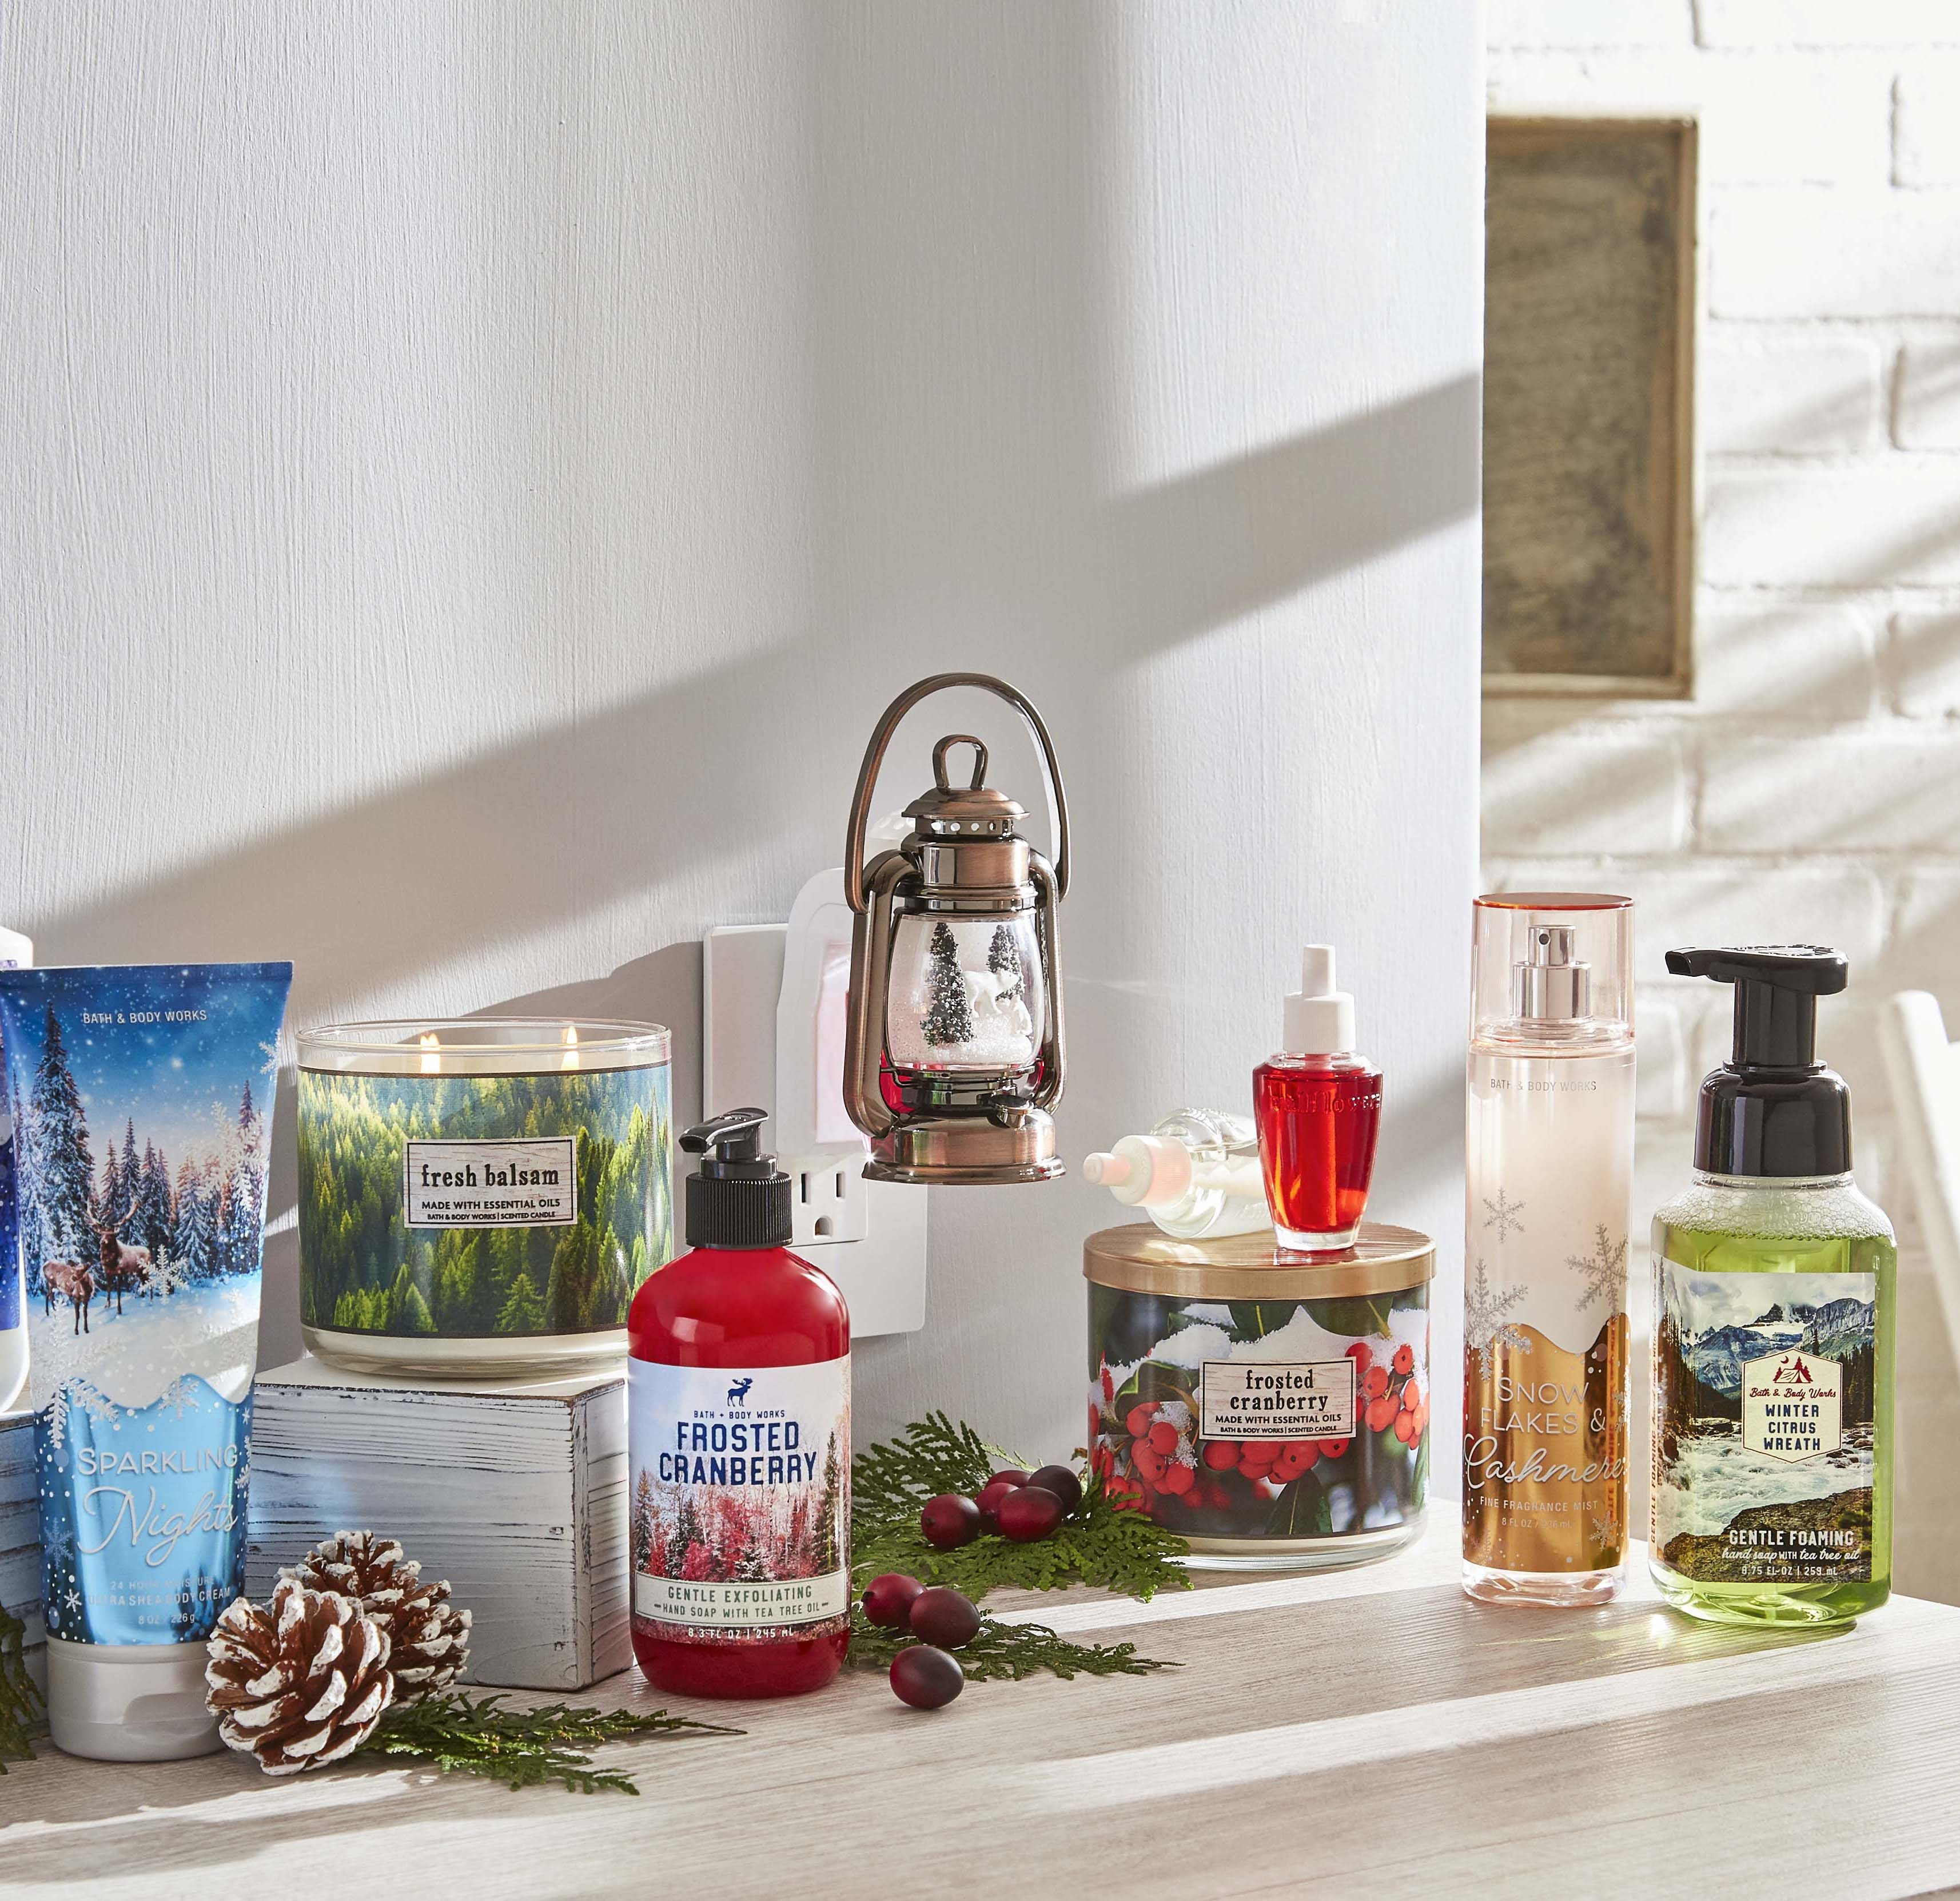 Snowy Lantern Scene Nightlight Wallflowers Fragrance Plug in 2018